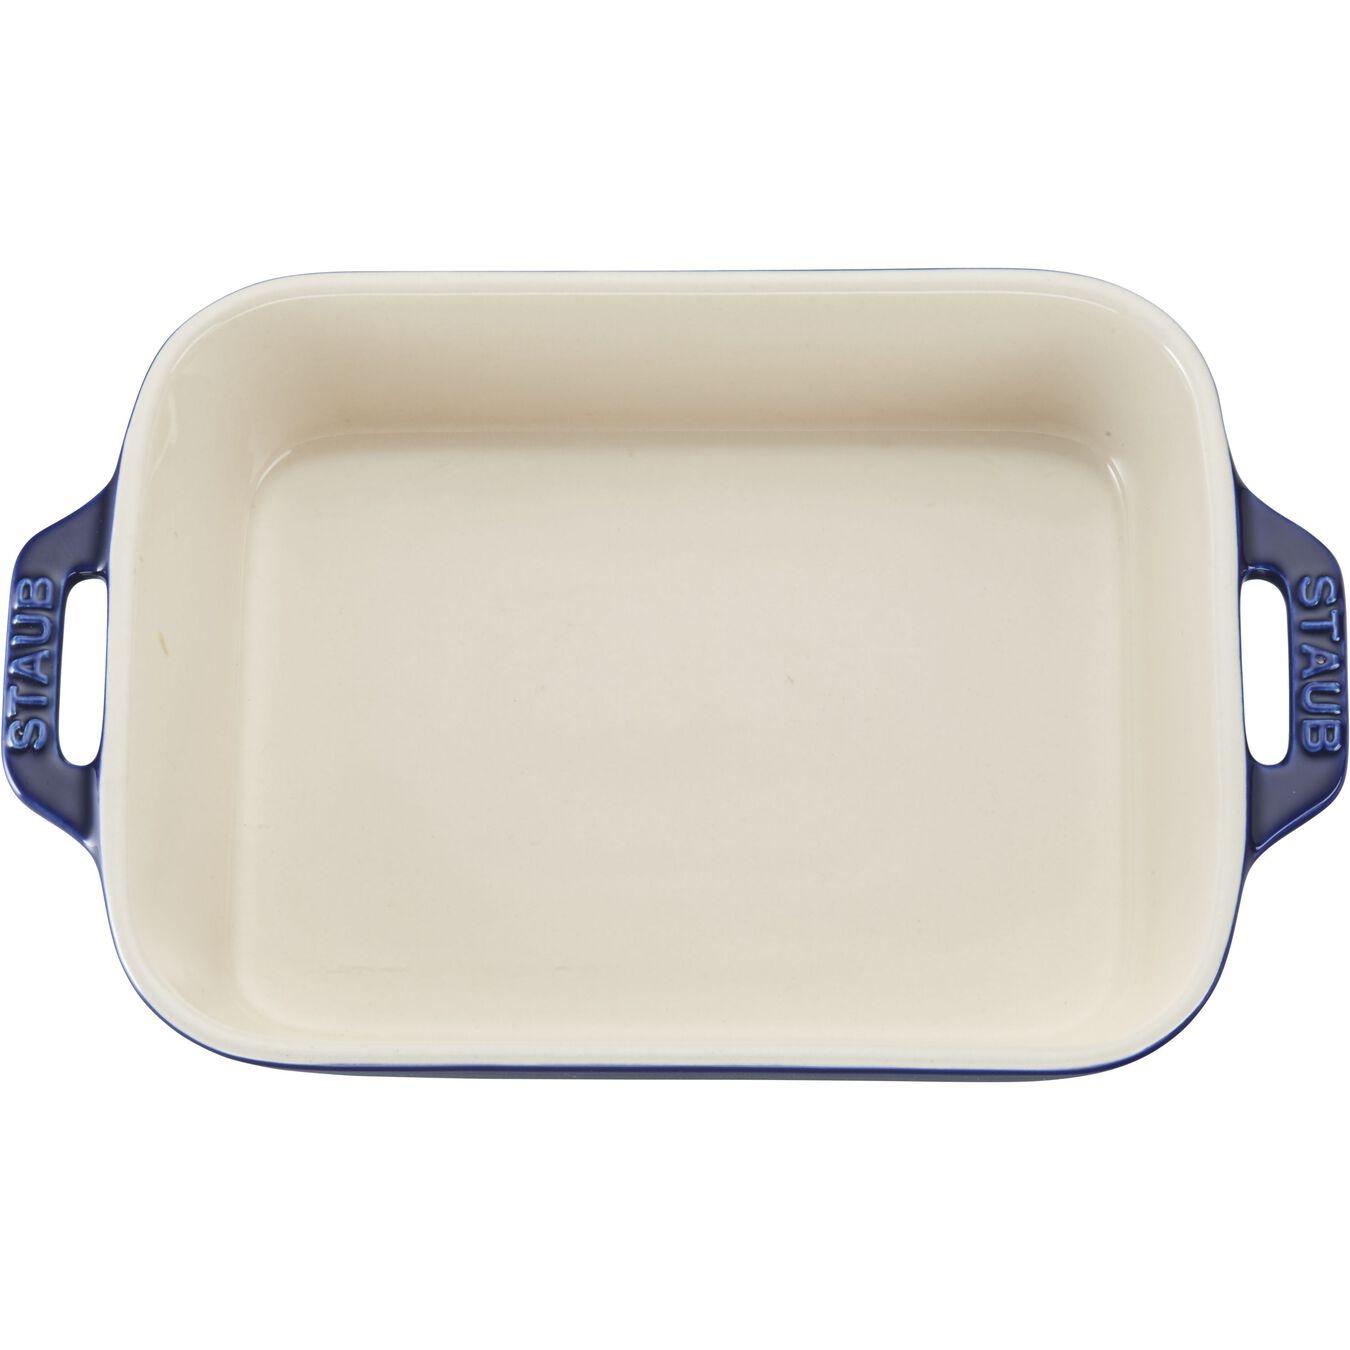 8-inch, rectangular, Special shape bakeware, dark blue,,large 2